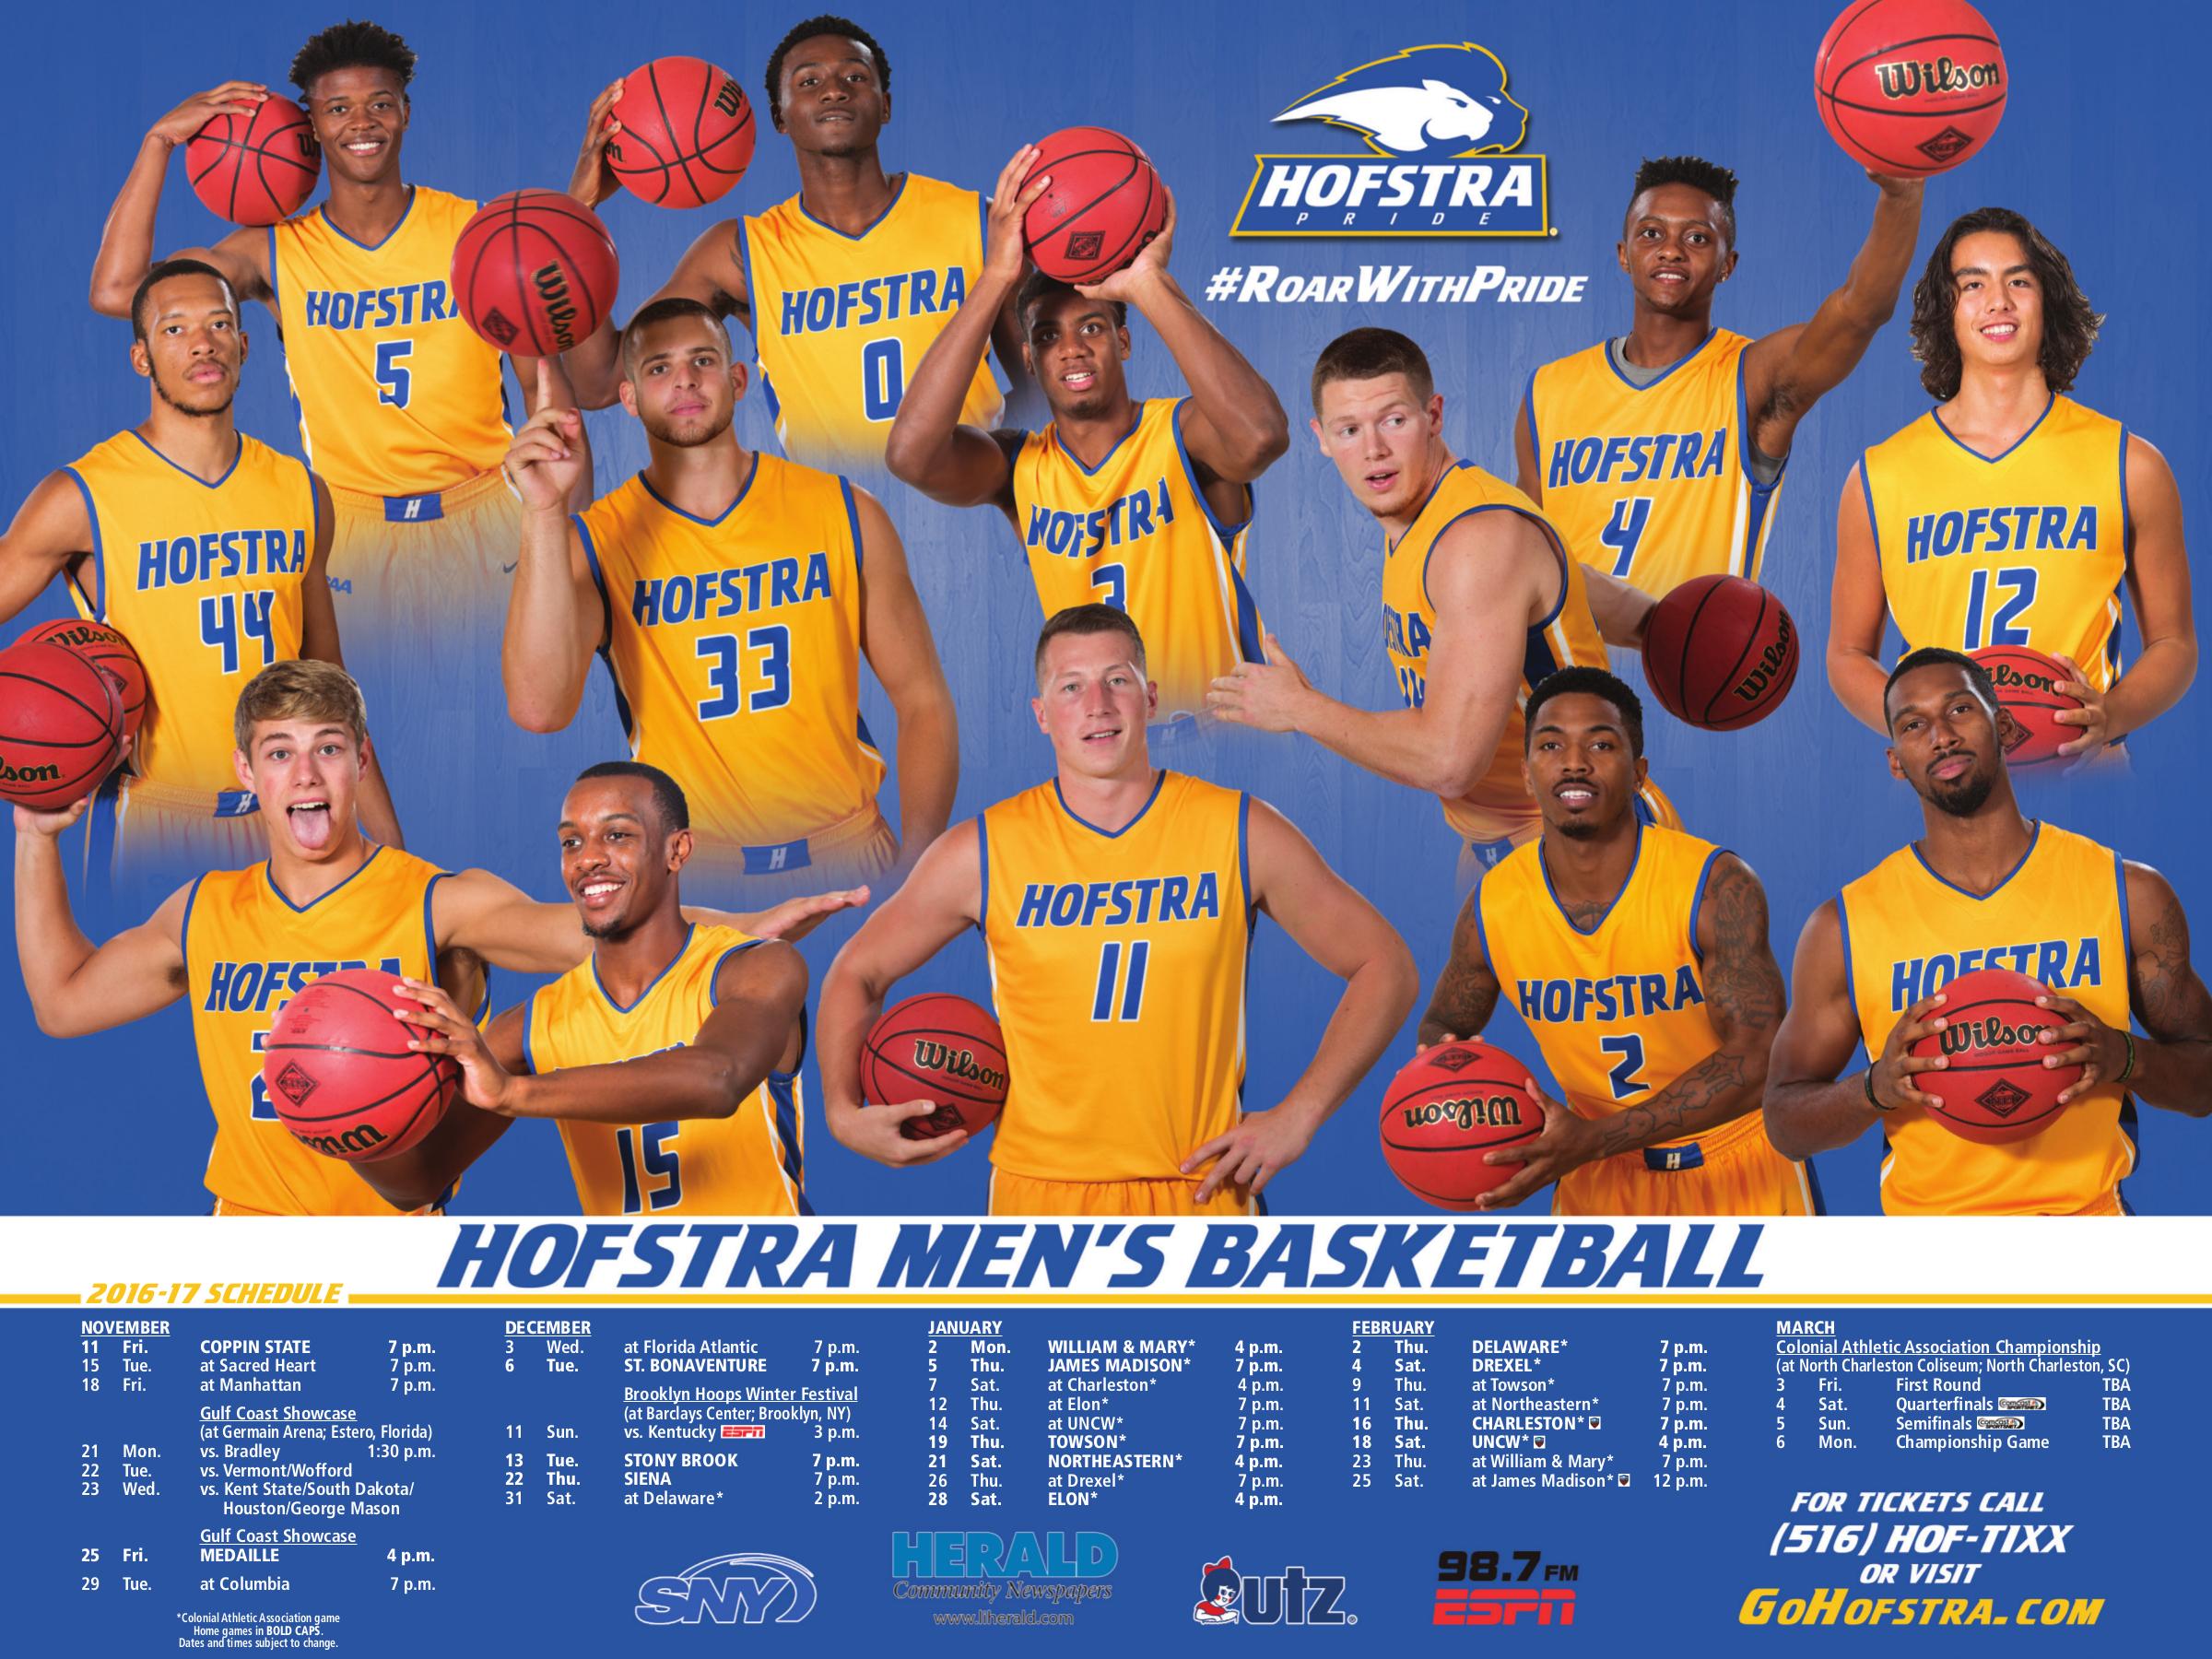 Hofstra Sport Poster